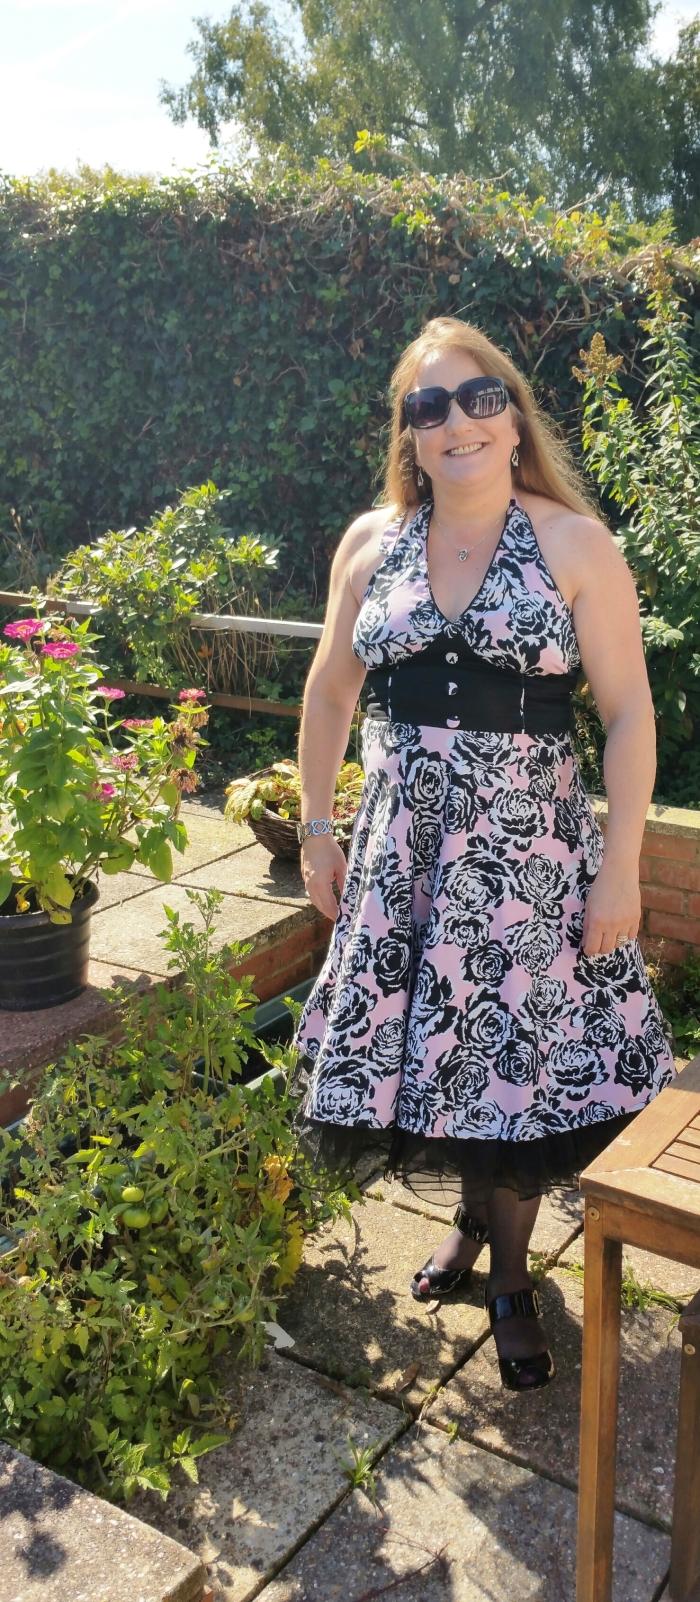 Author, Poet, Writer & Blogger, Judy Martin